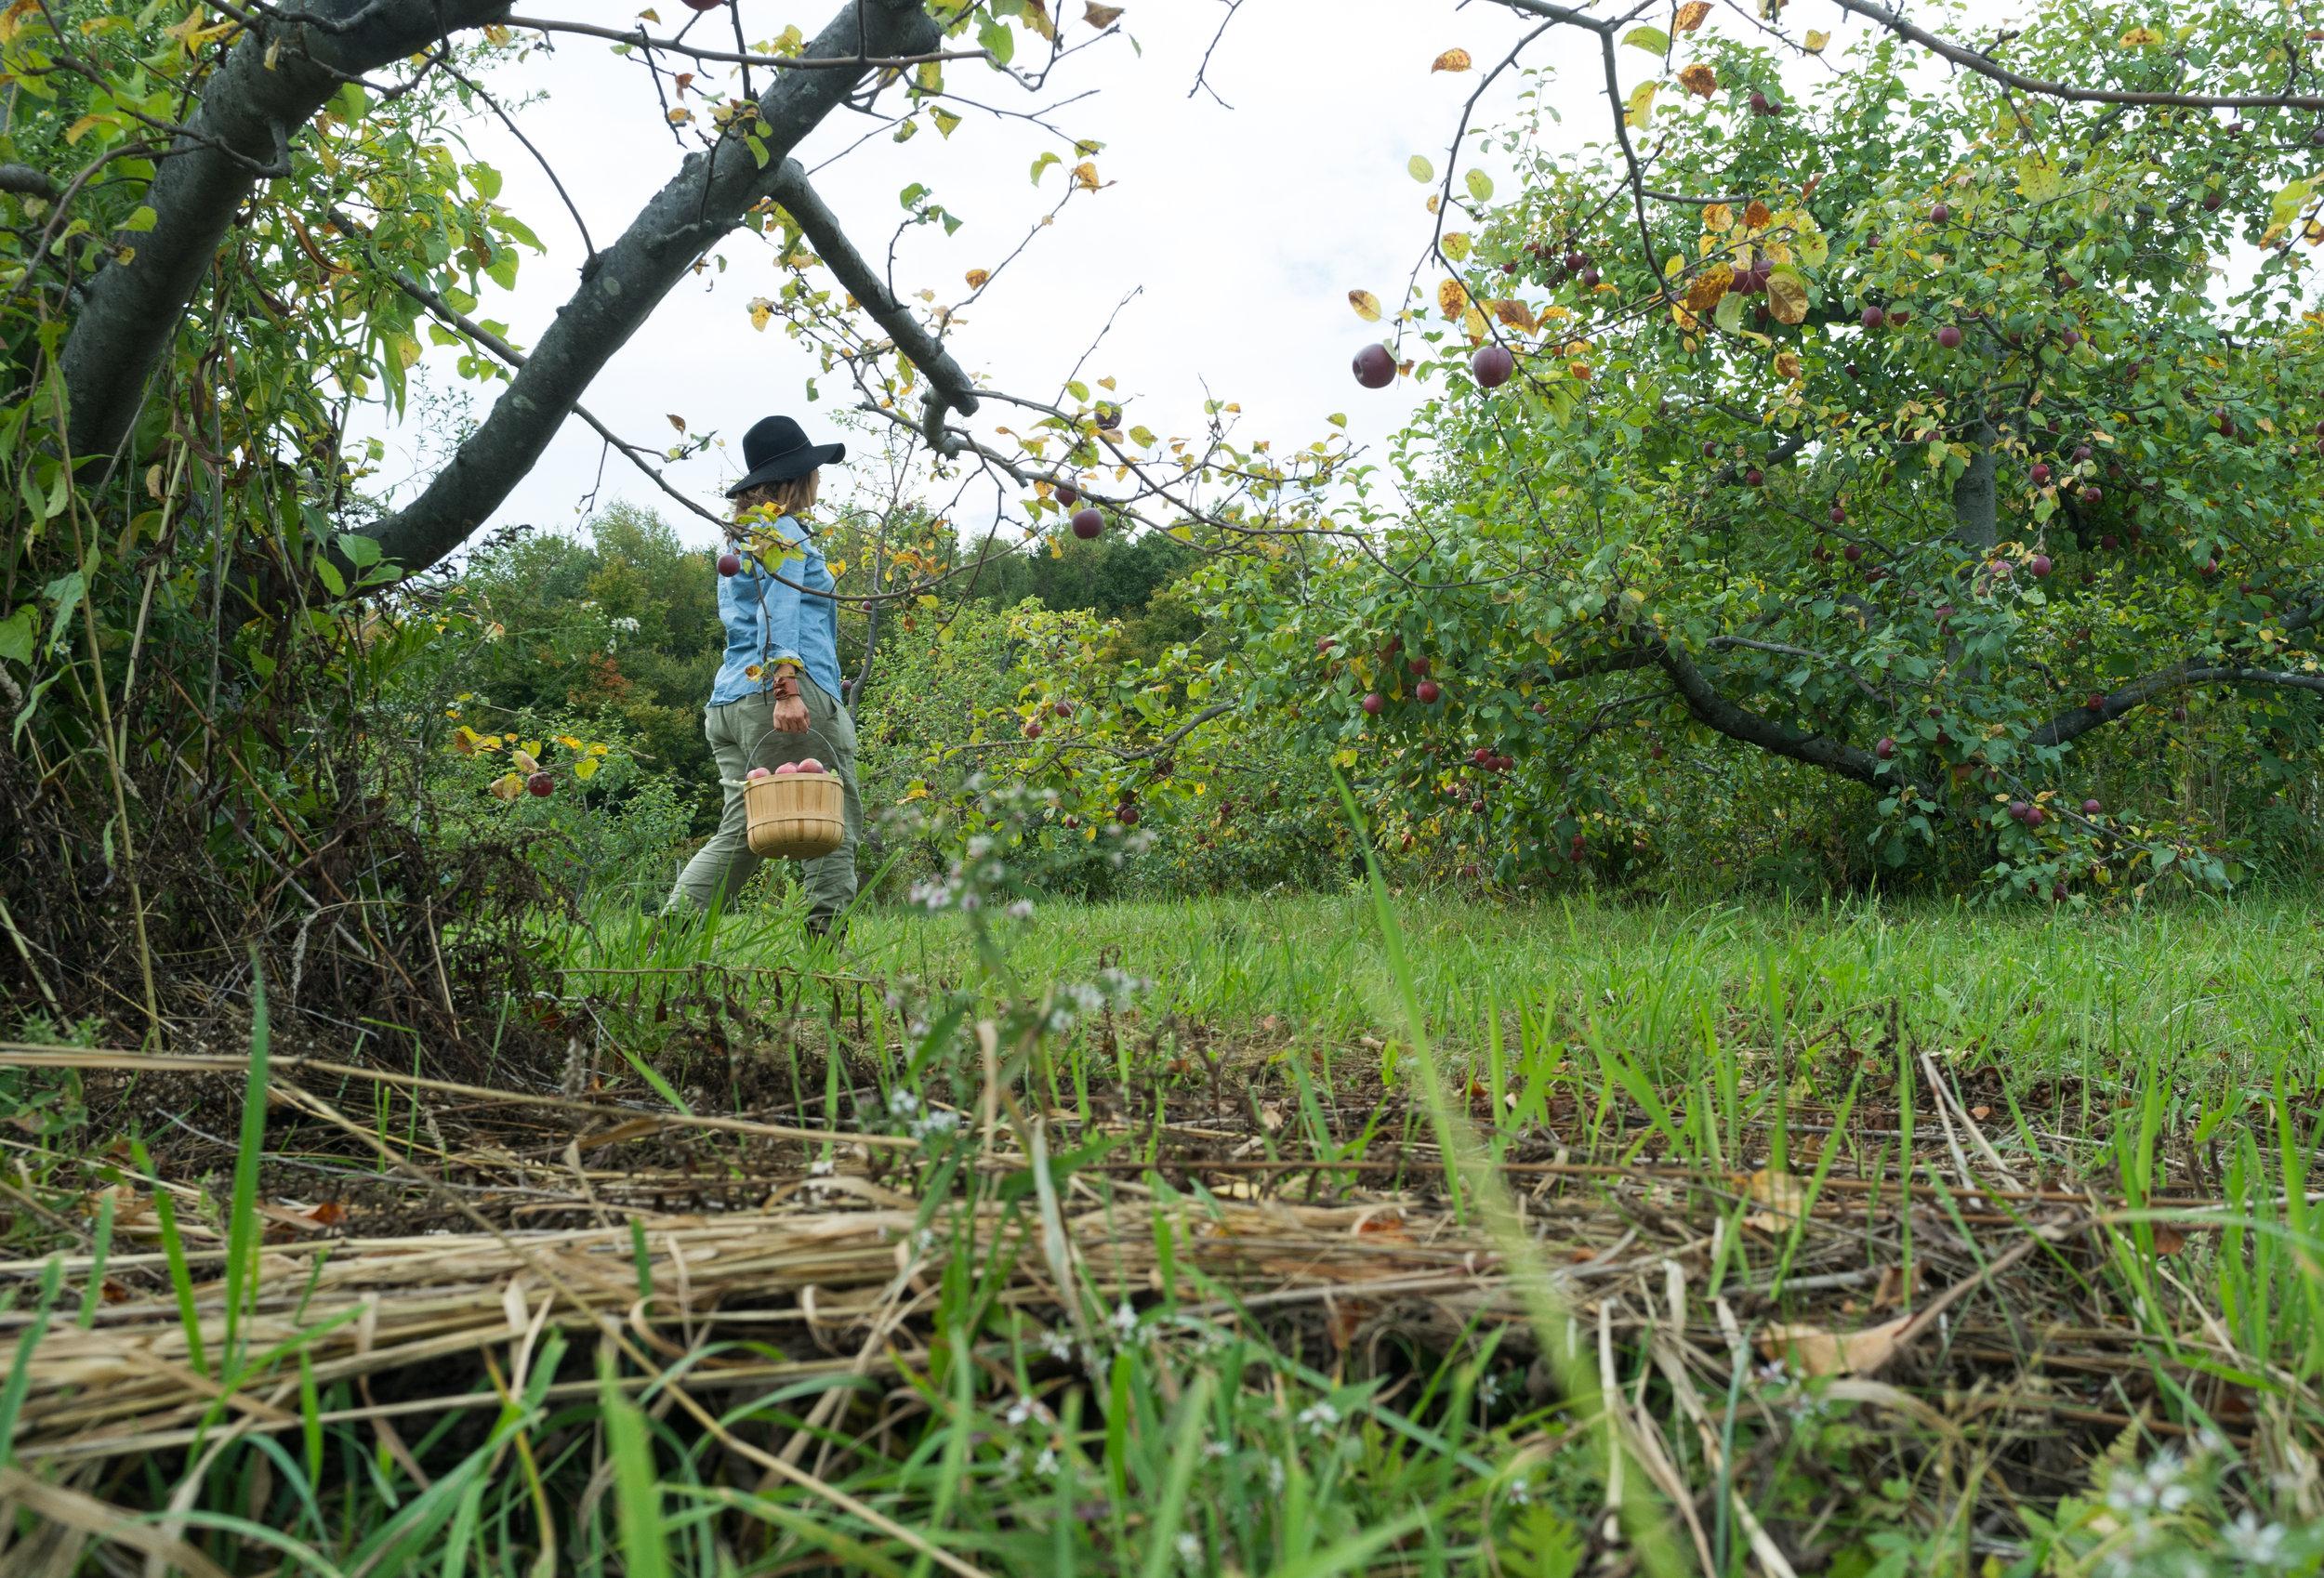 Walking along the aisles of apples.